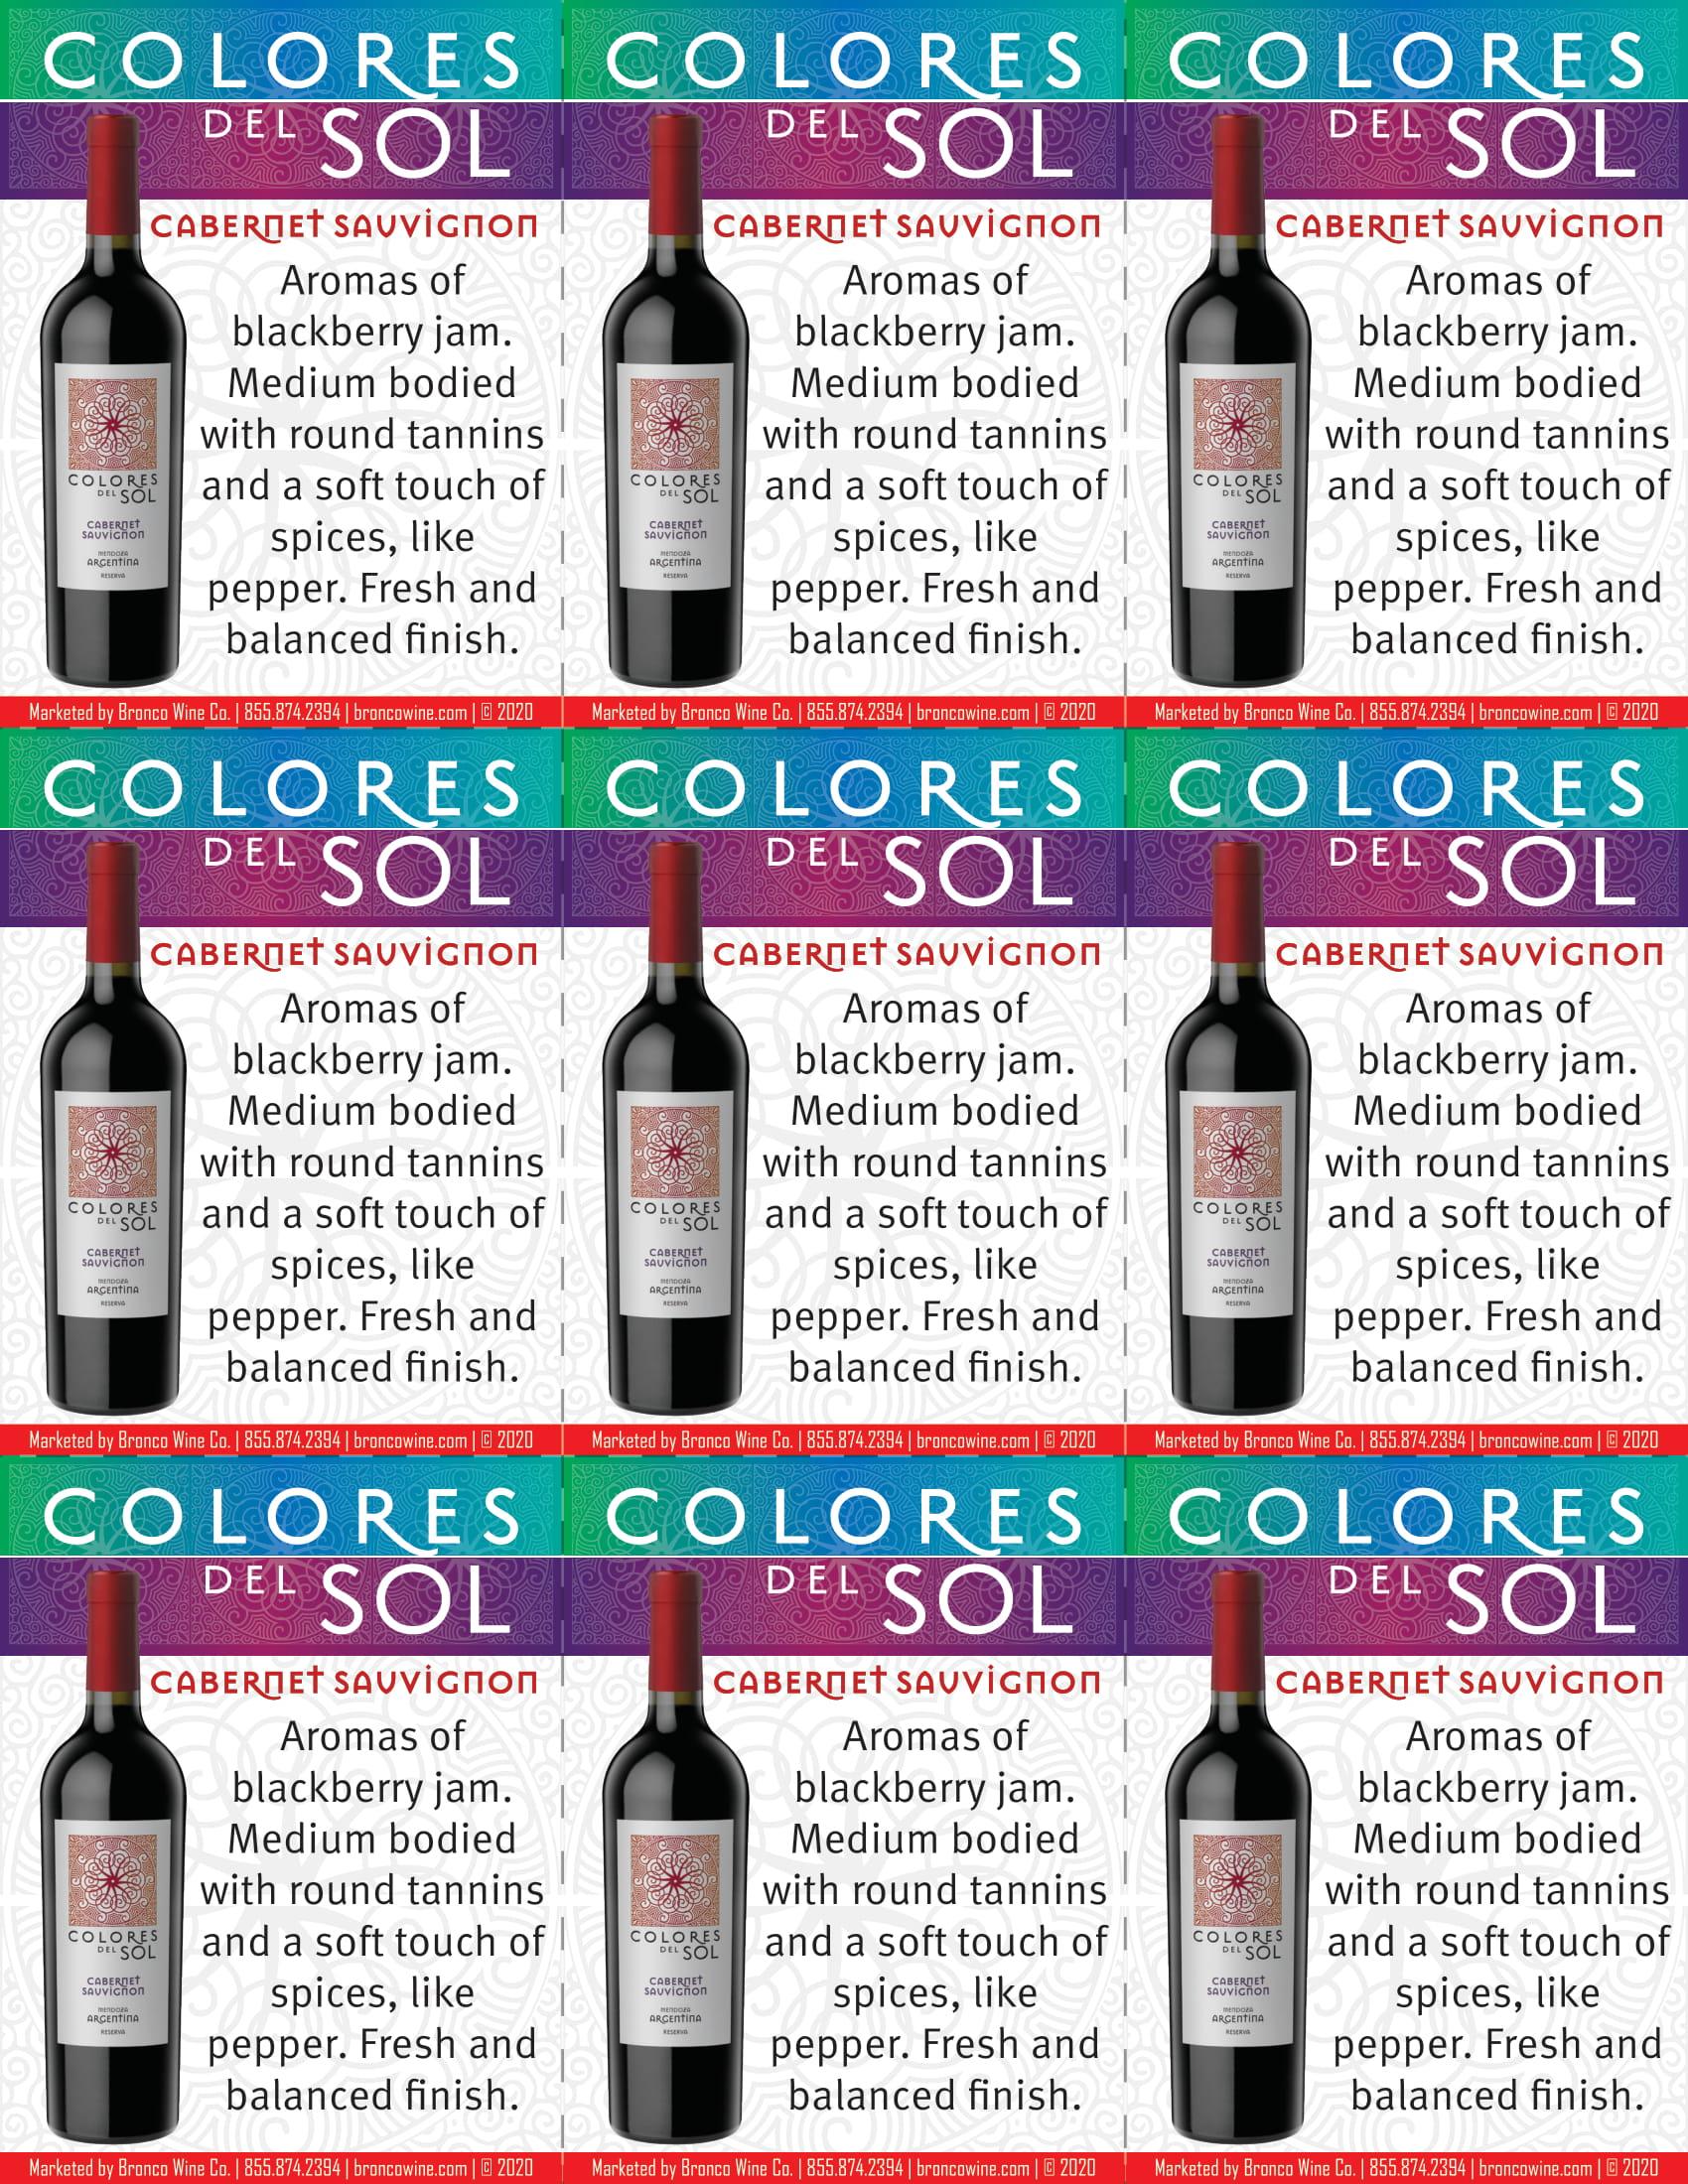 Colores Del Sol Cabernet Sauvignon Shelf Talkers